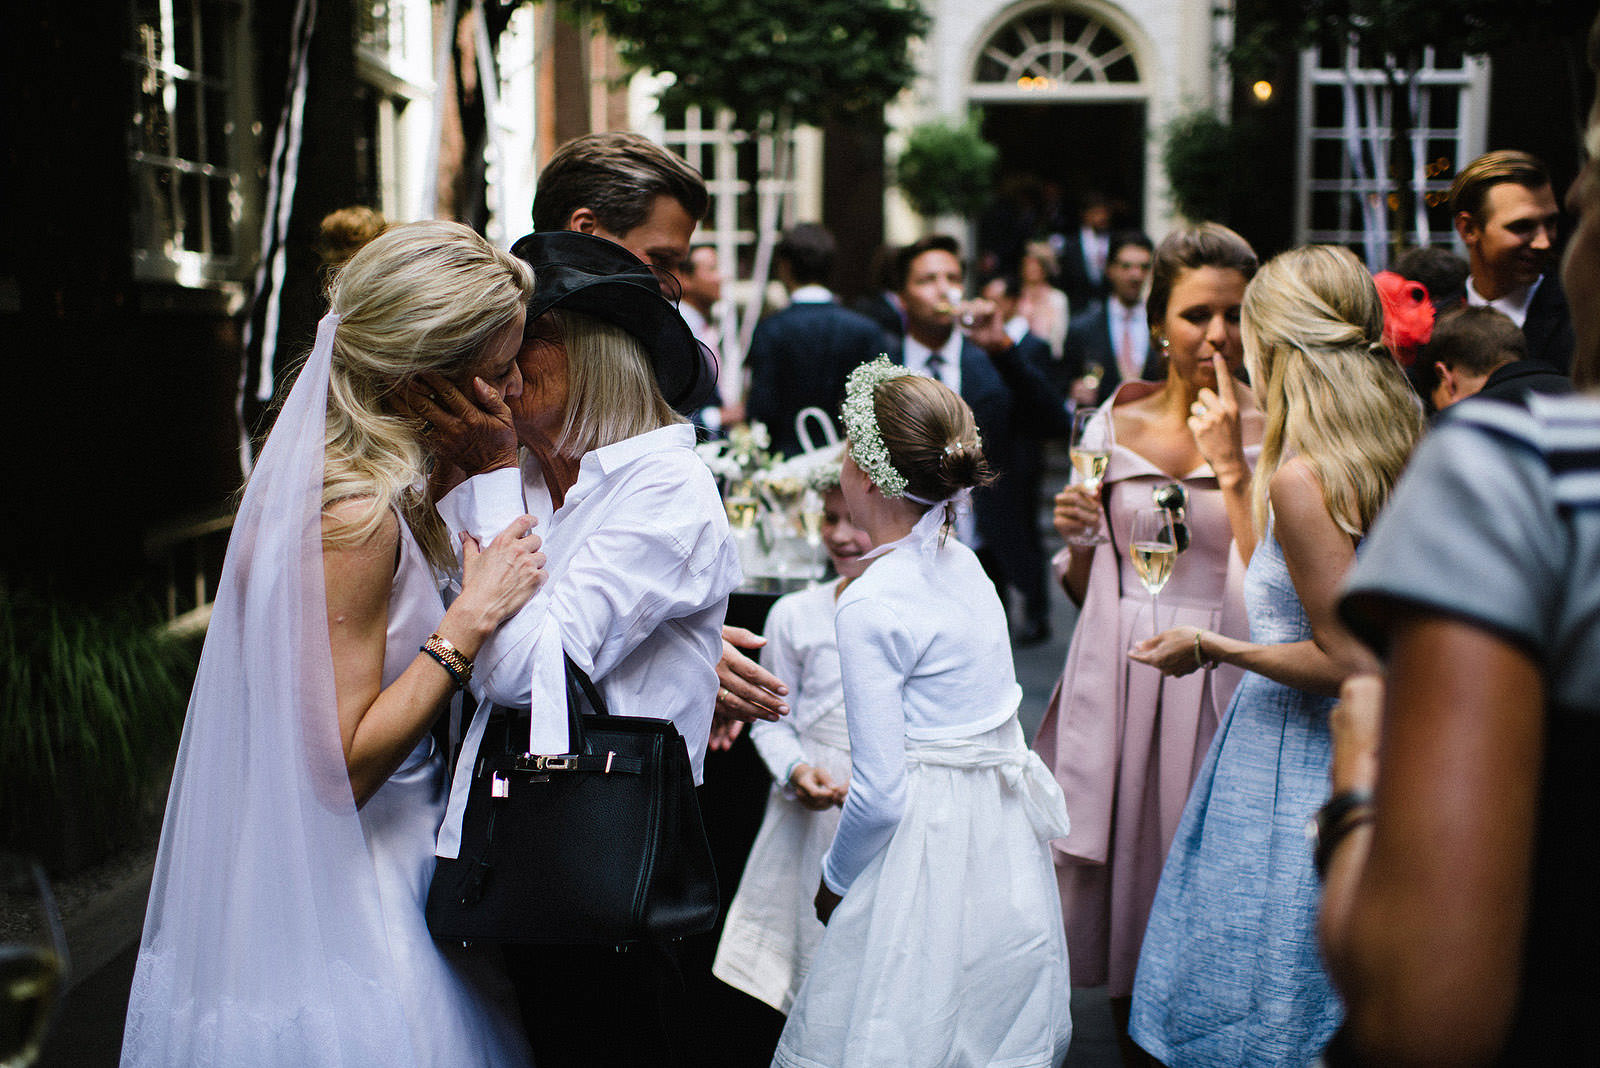 Fotograf Konstanz - Destination Wedding Photographer Amsterdam 068 - Destination Wedding Amsterdam  - 178 -